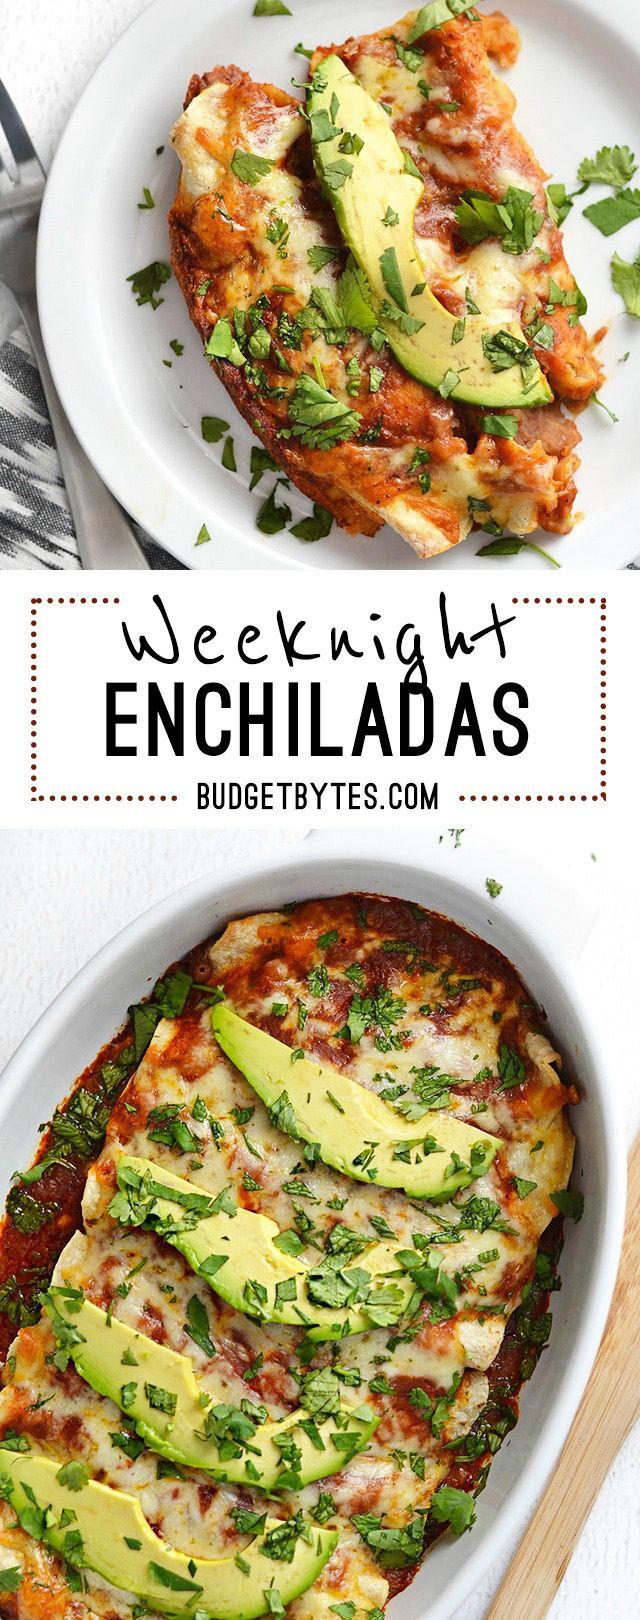 Weeknight Enchiladas - BudgetBytes.com